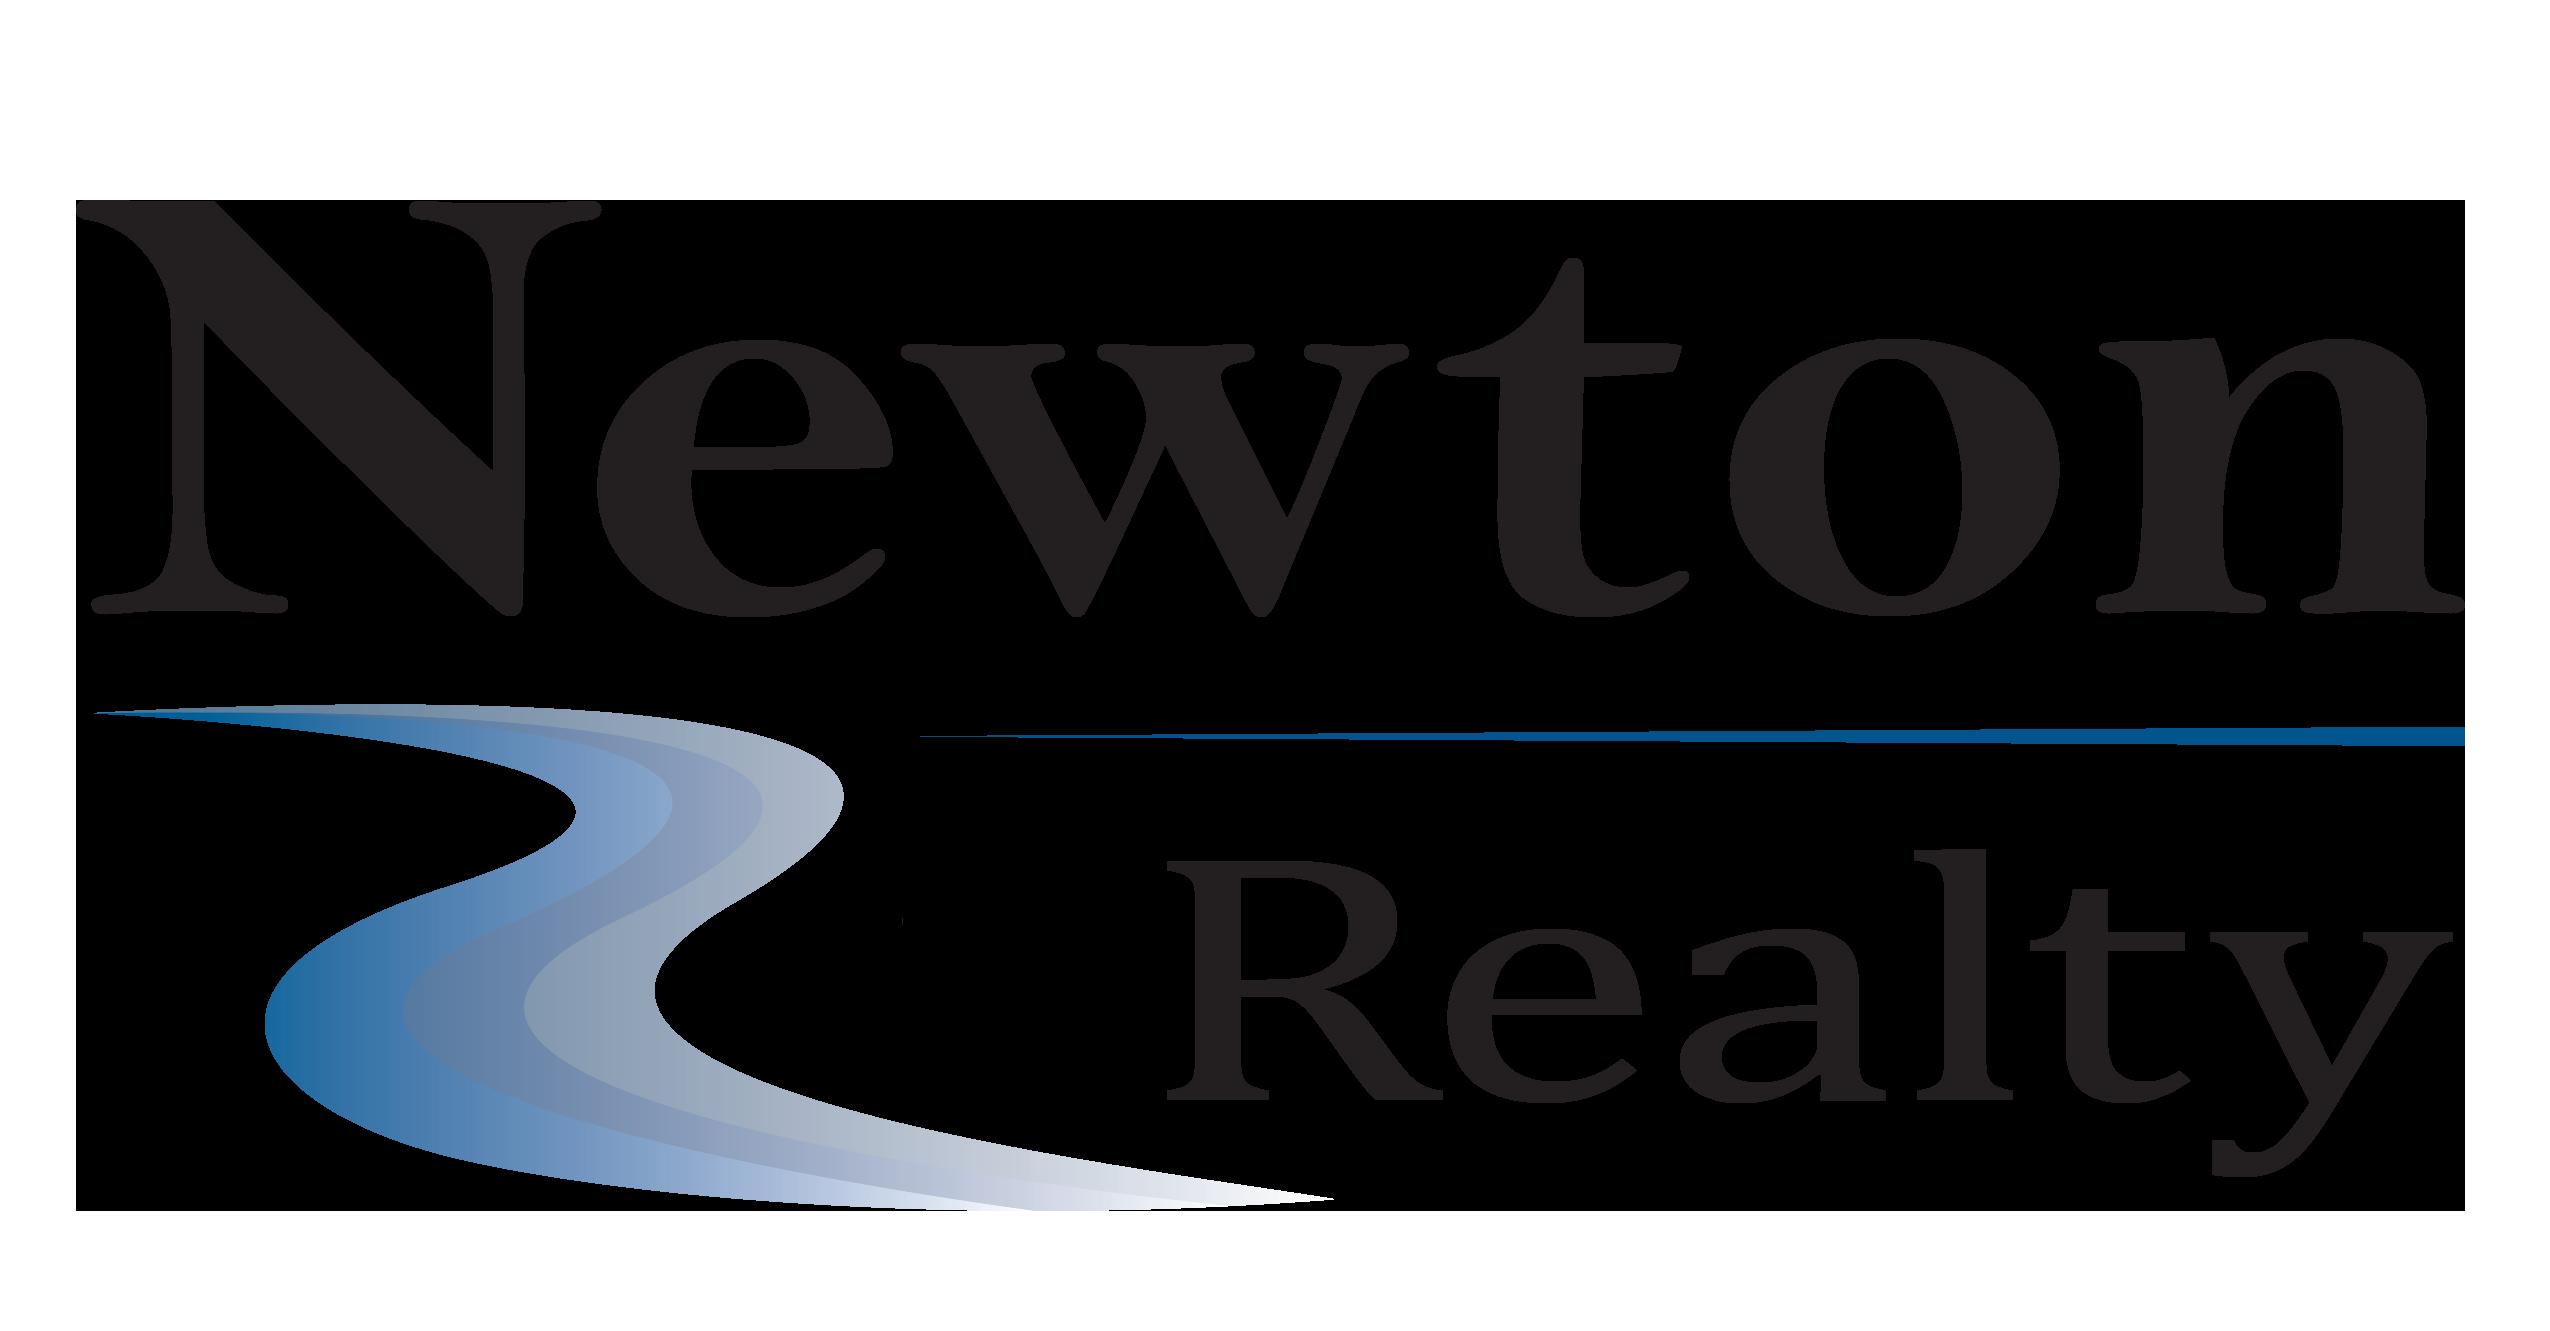 Newton Realty